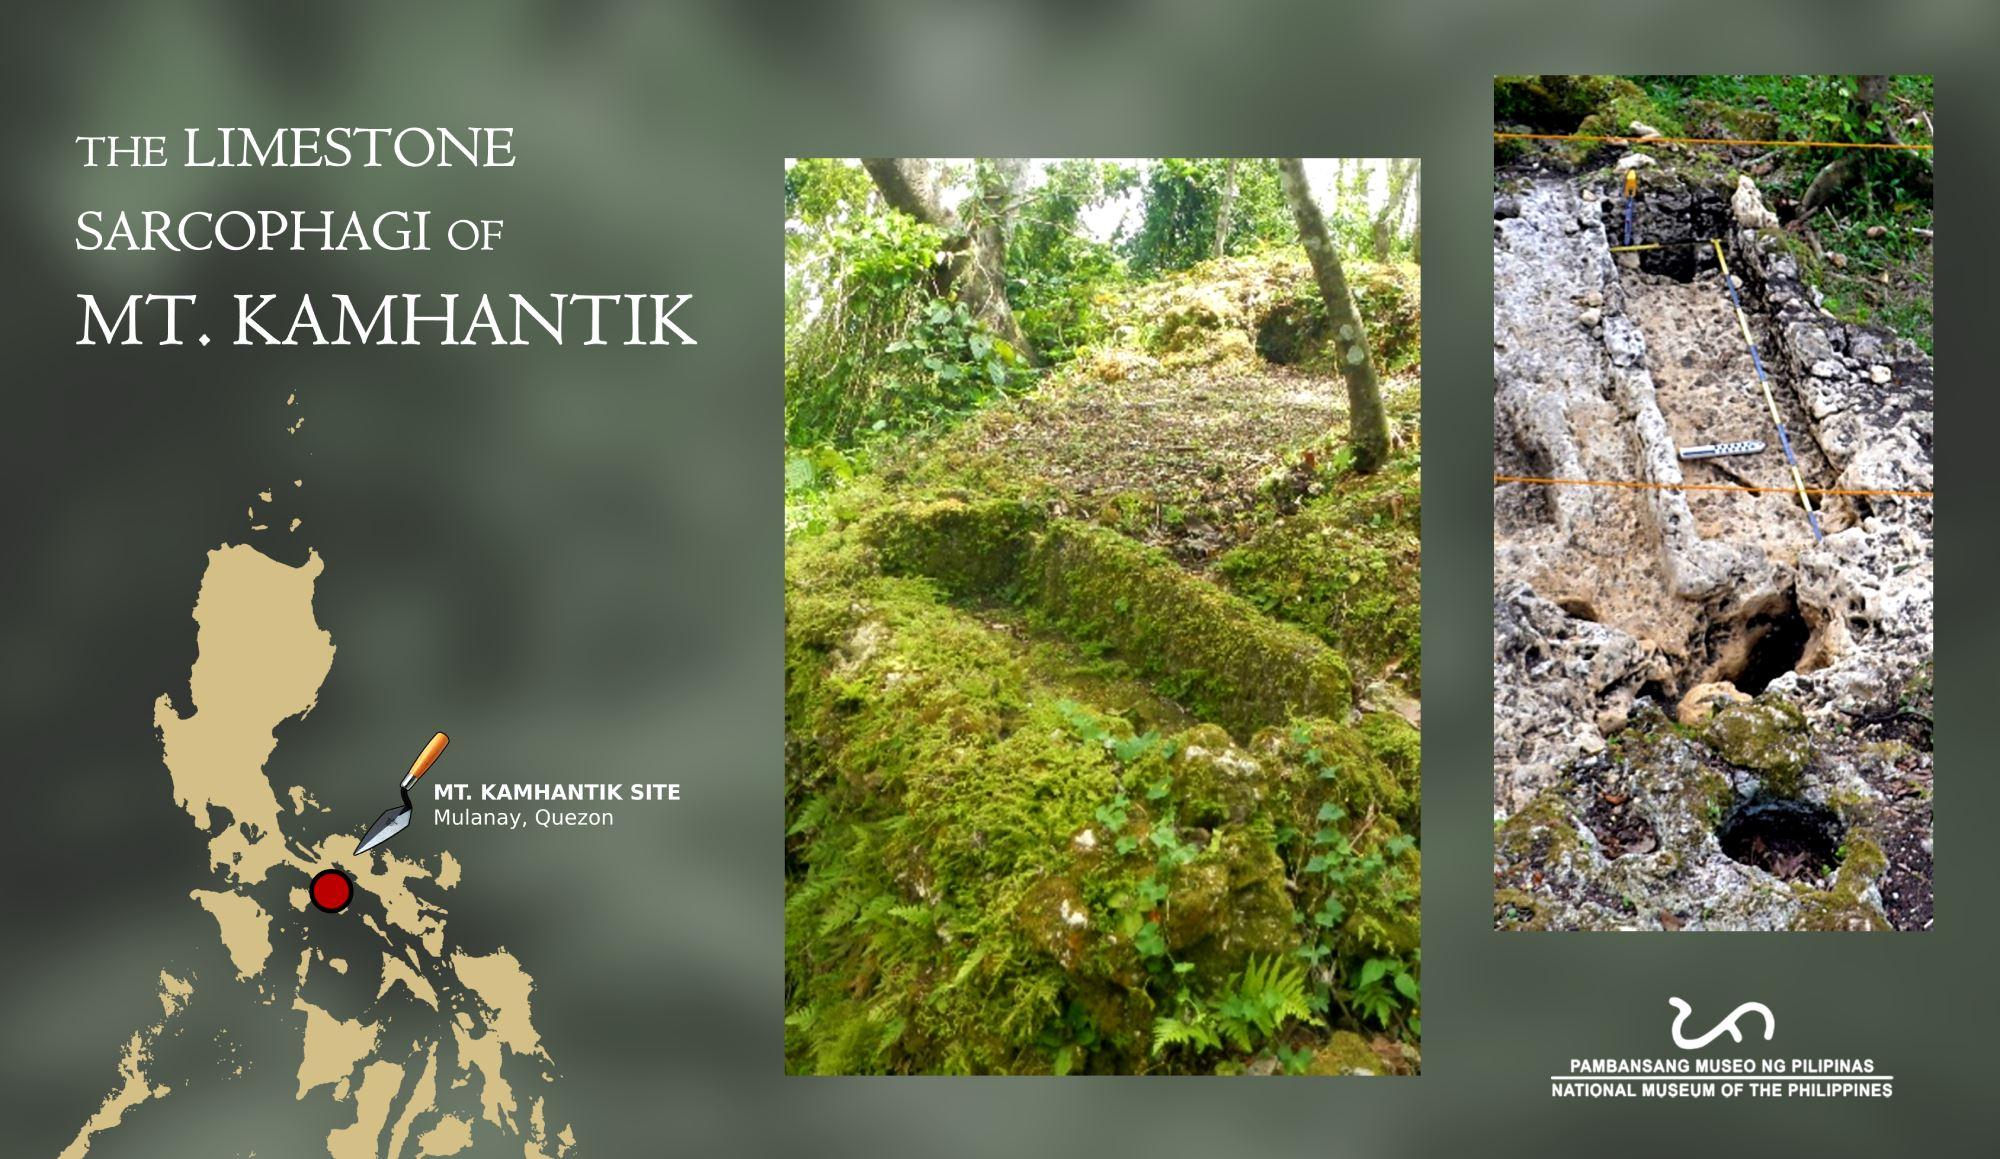 The Prehistoric Stone Sarcophagus in Mt. Kamhantik [Mulanay, Quezon Province]